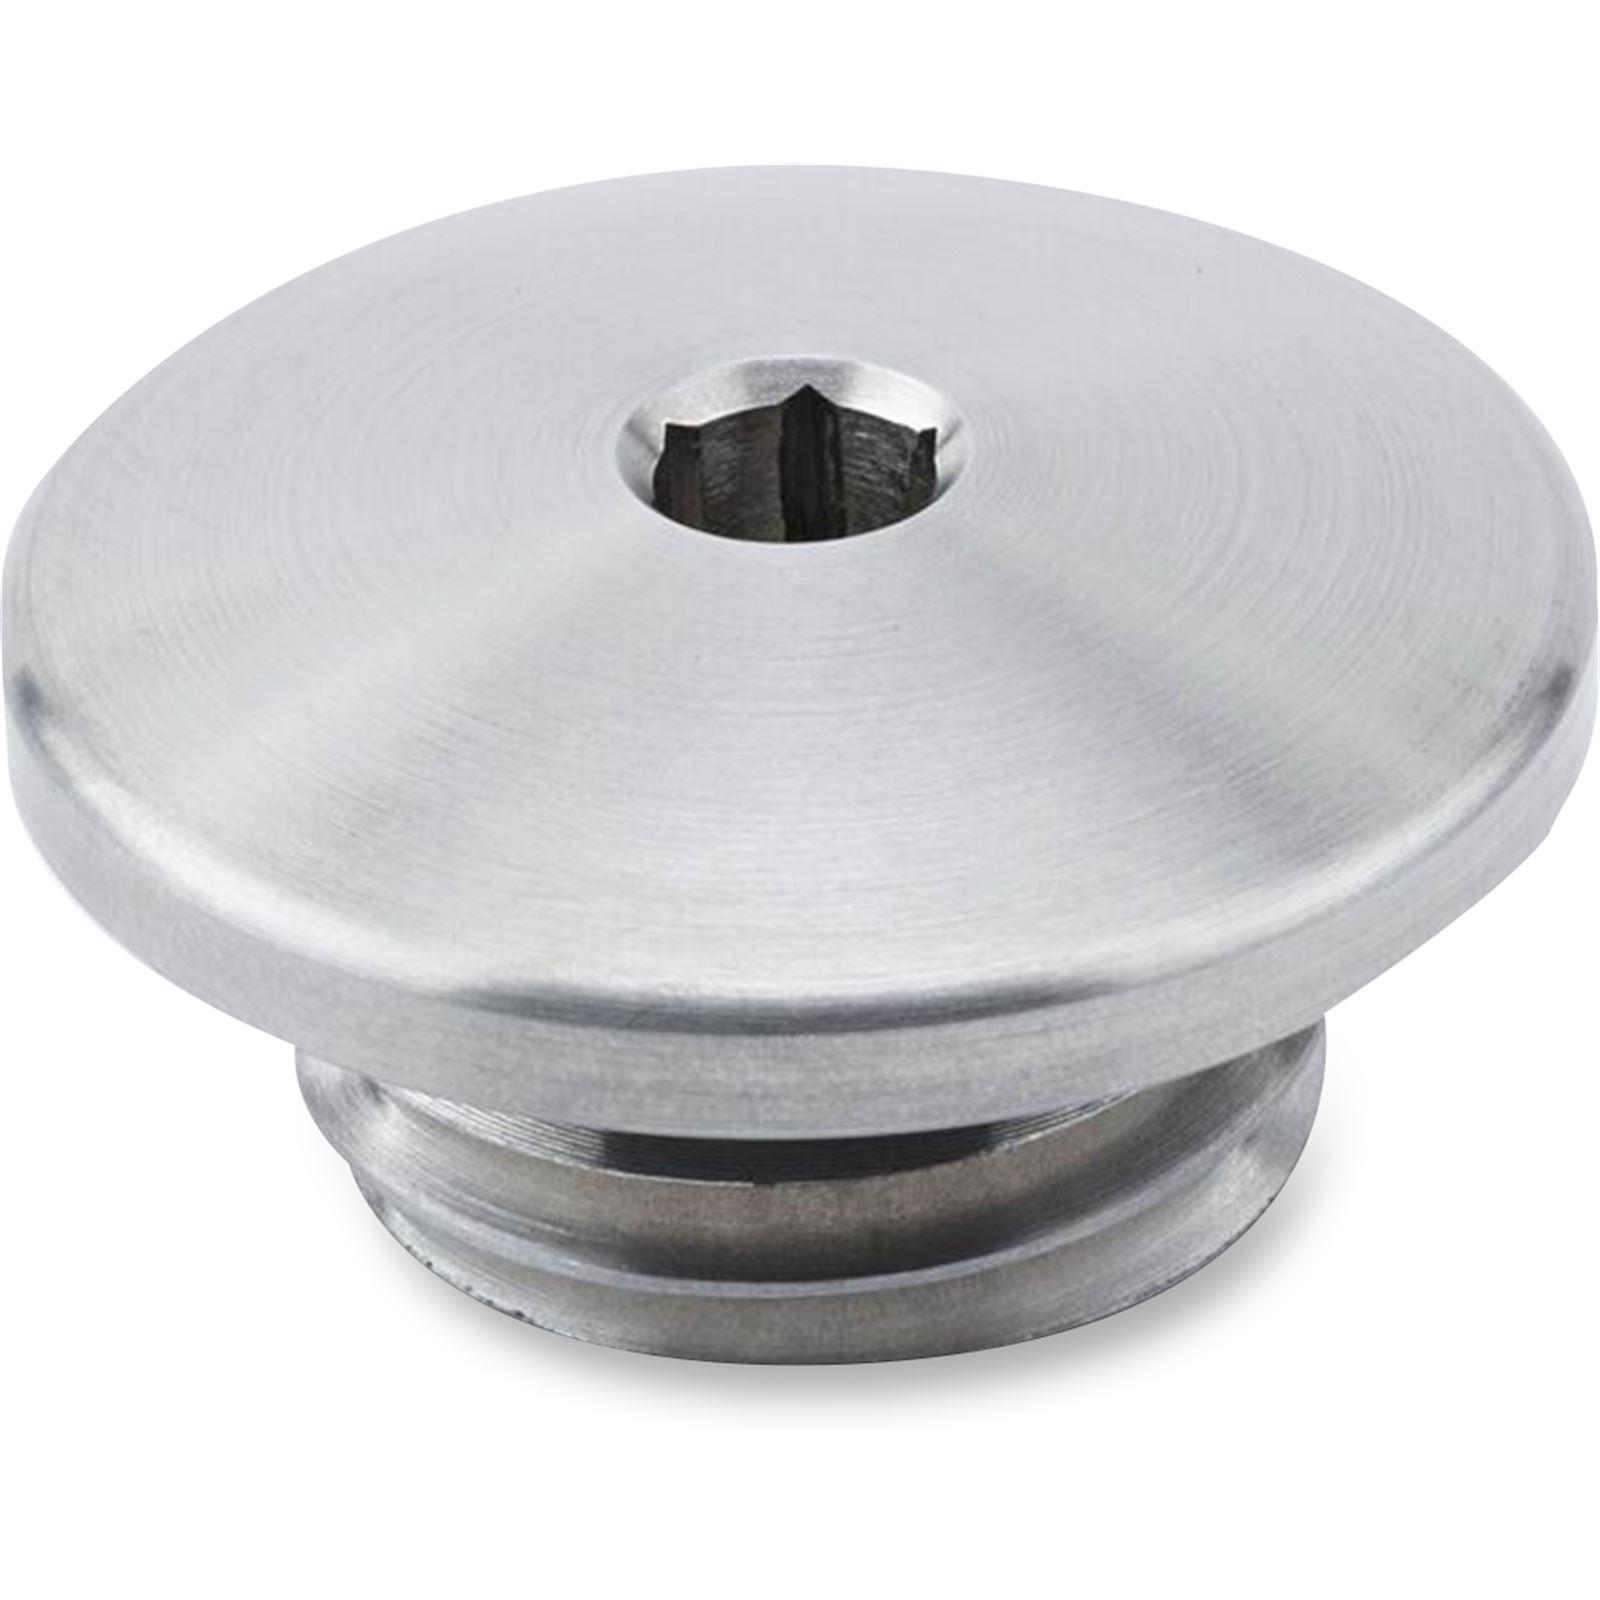 British Customs Oil Filler Cap - Stainless Steel - Brushed